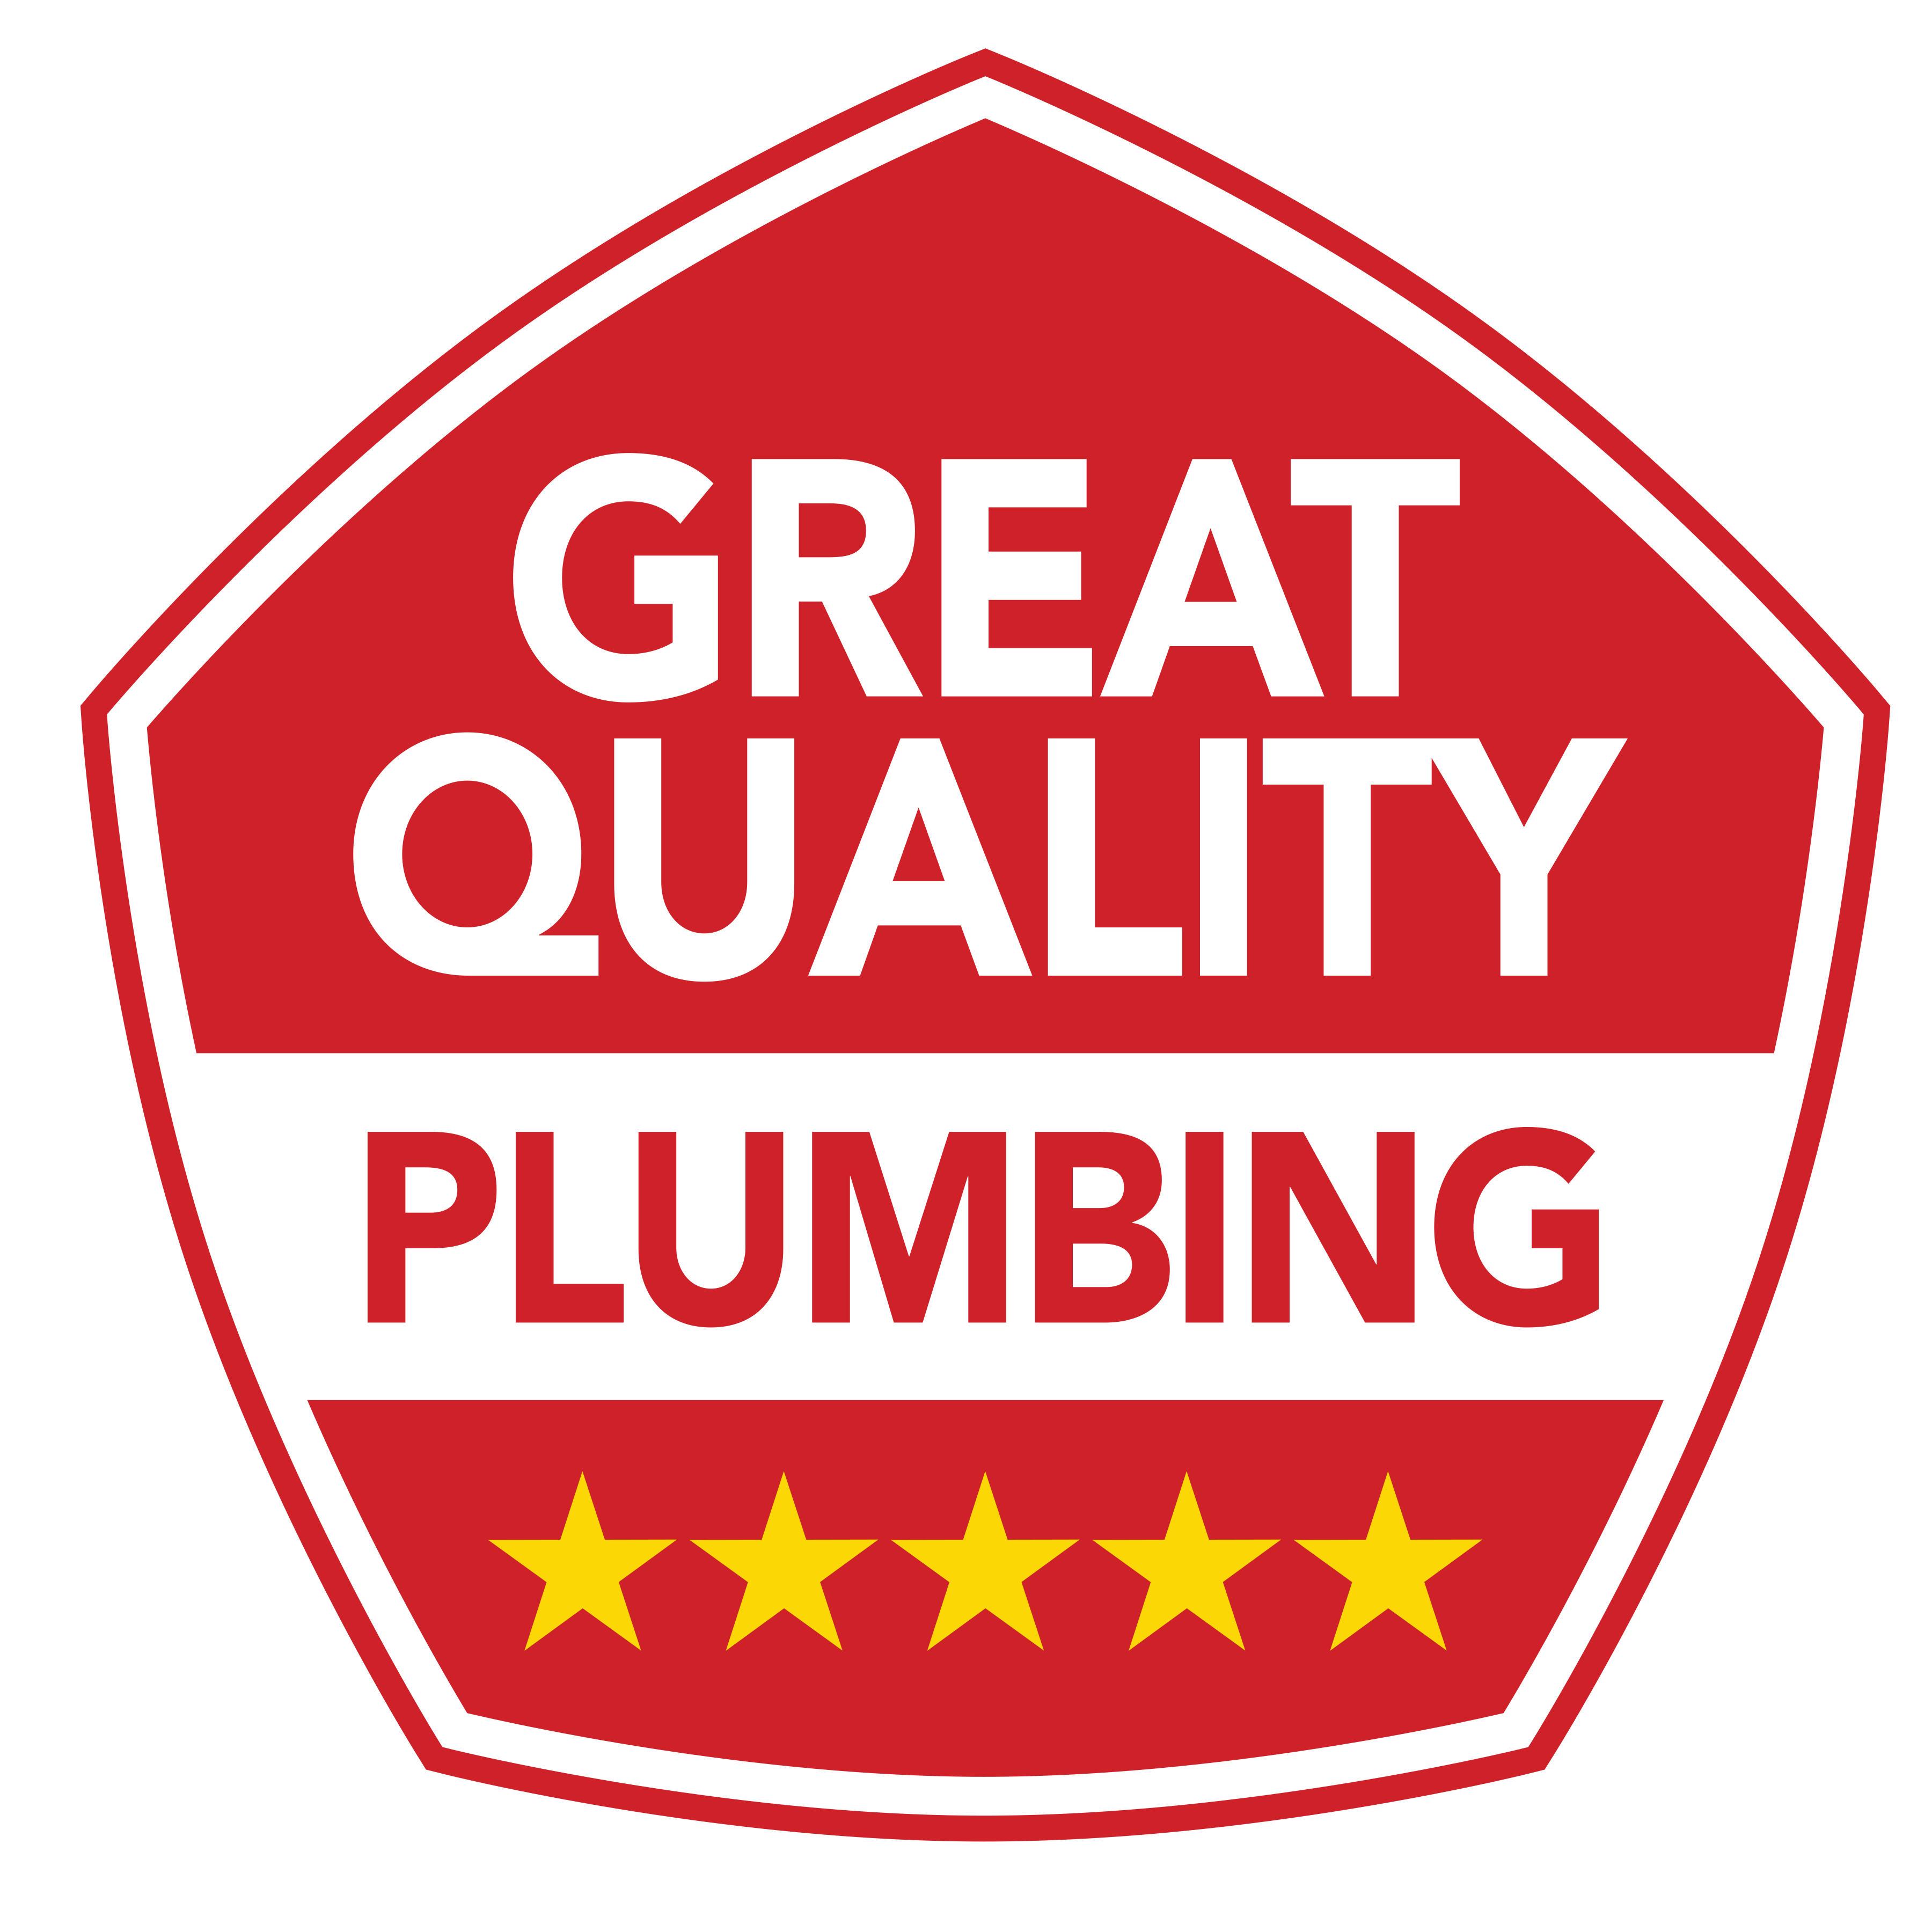 Great Quality Plumbing Brooklyn Park Minnesota MN